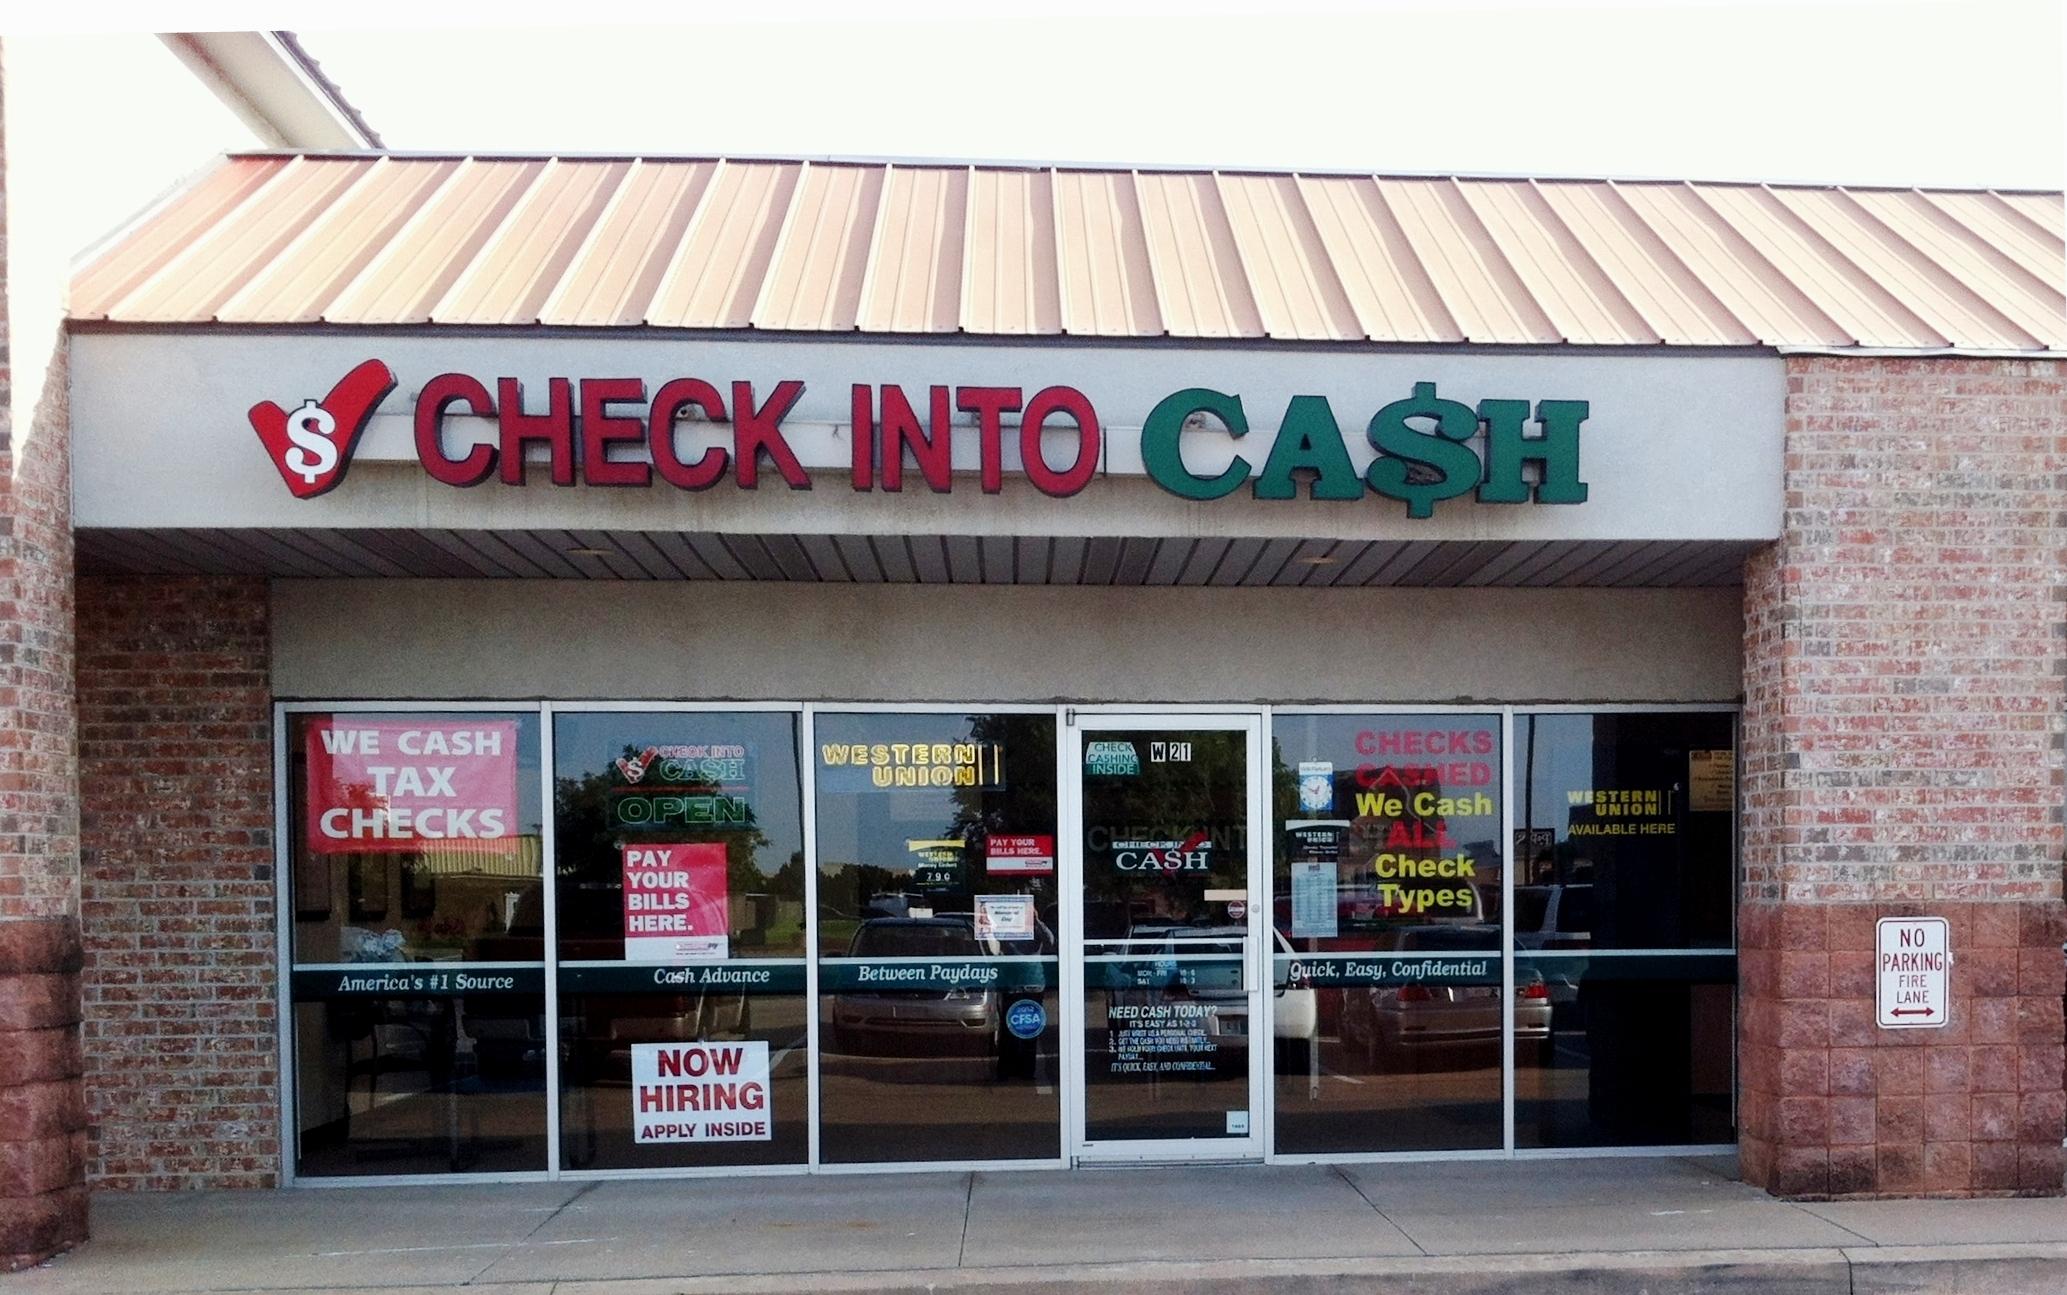 Cash jar payday loan photo 4